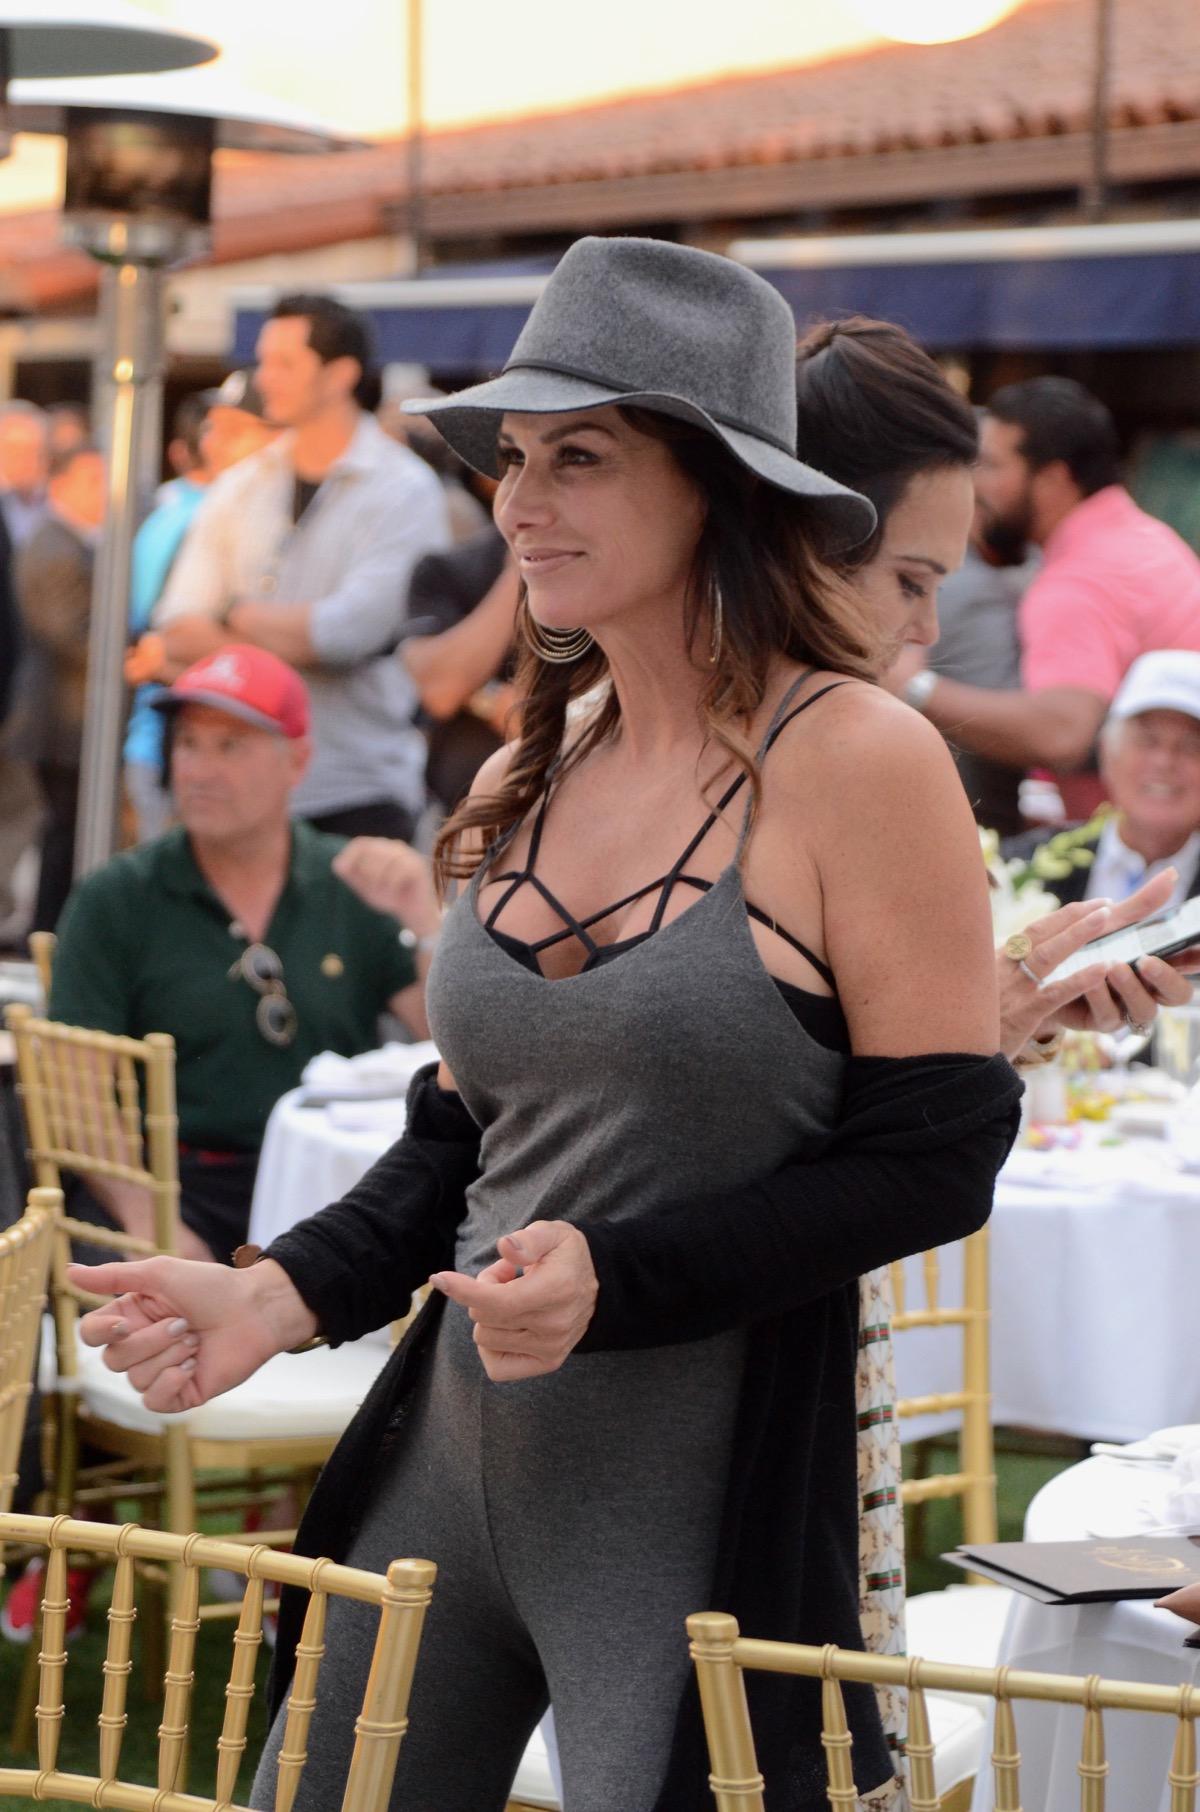 12th Annual George Lopez Celebrity Golf Classic Photos - 212.jpg